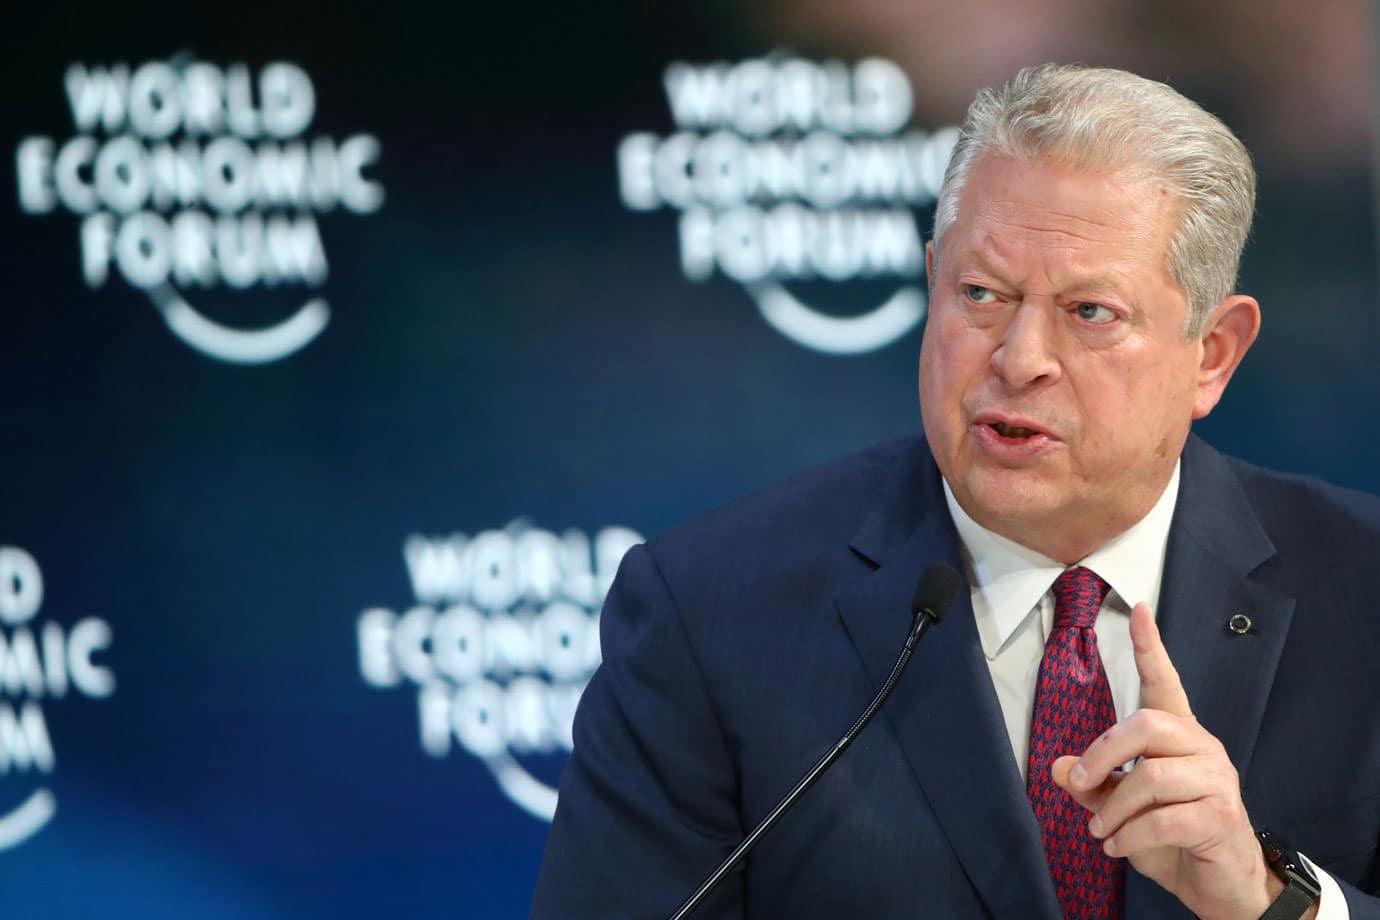 Al Gore in Davos